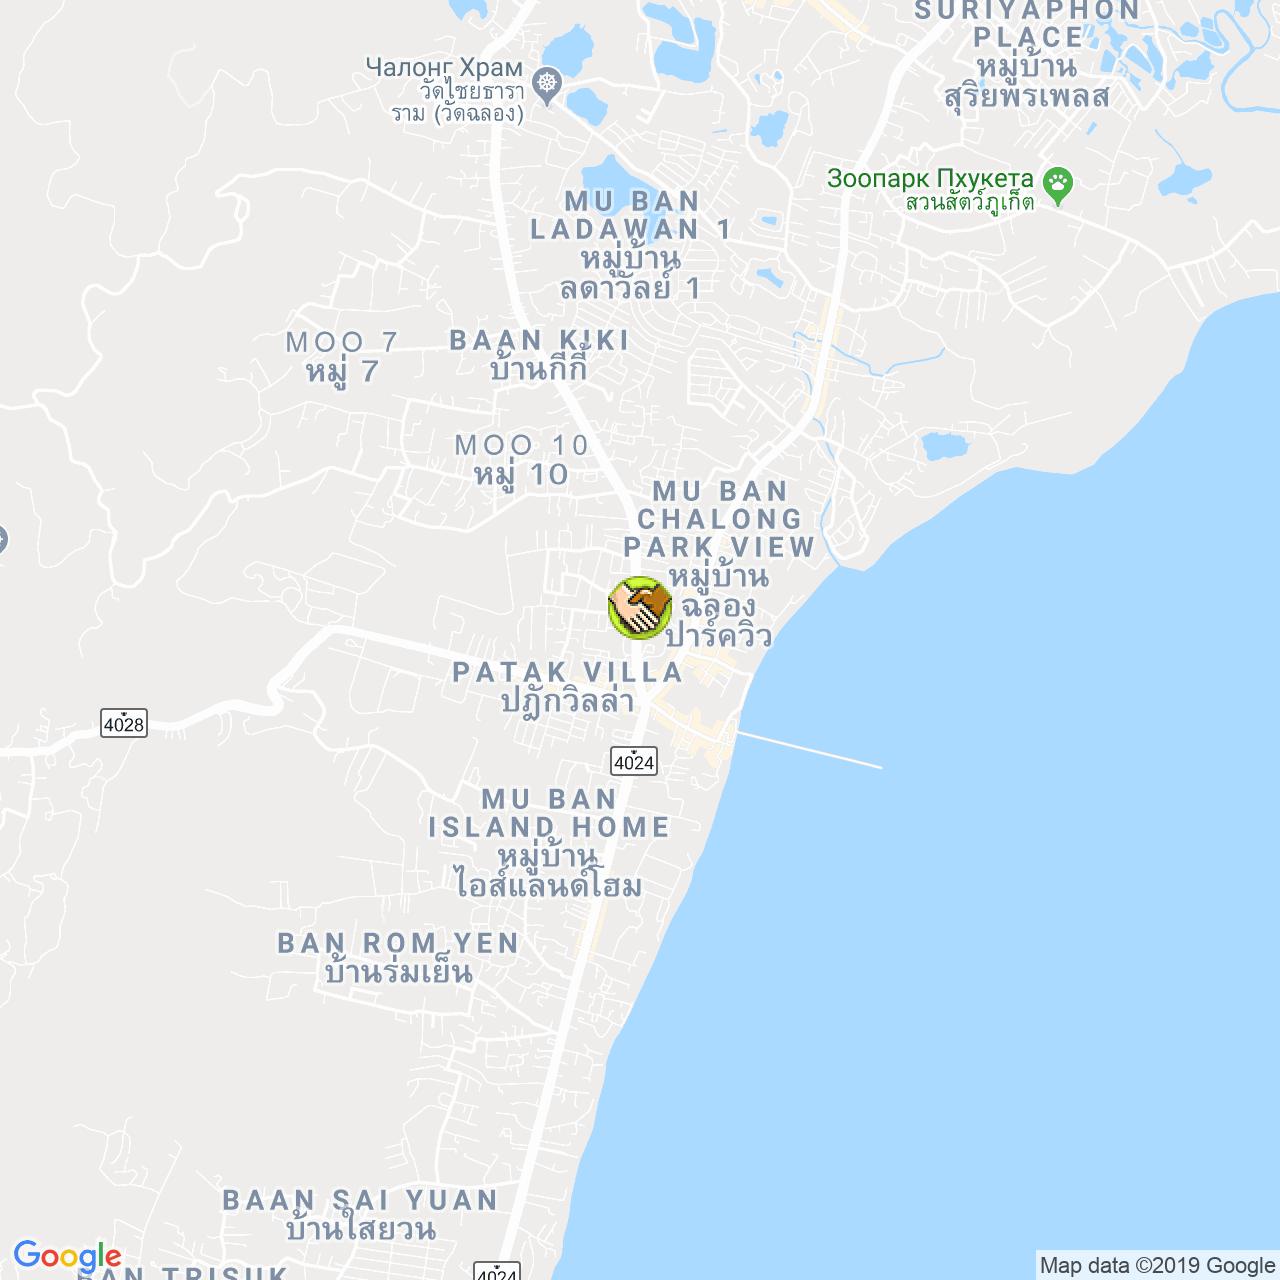 VillasHomes Agency на карте Пхукета